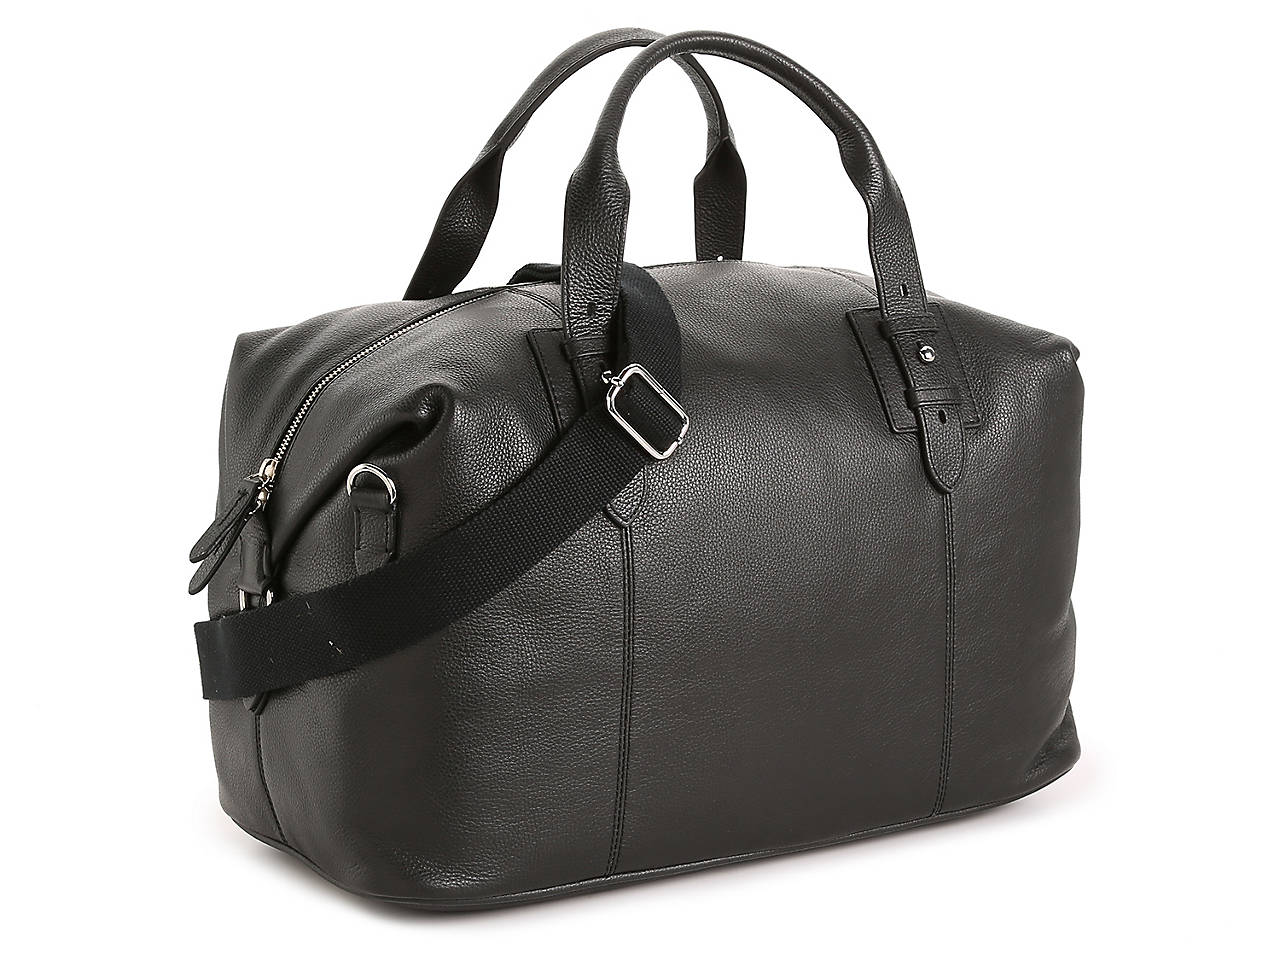 276137b755 Cole Haan Leather Weekender Bag Men s Handbags   Accessories